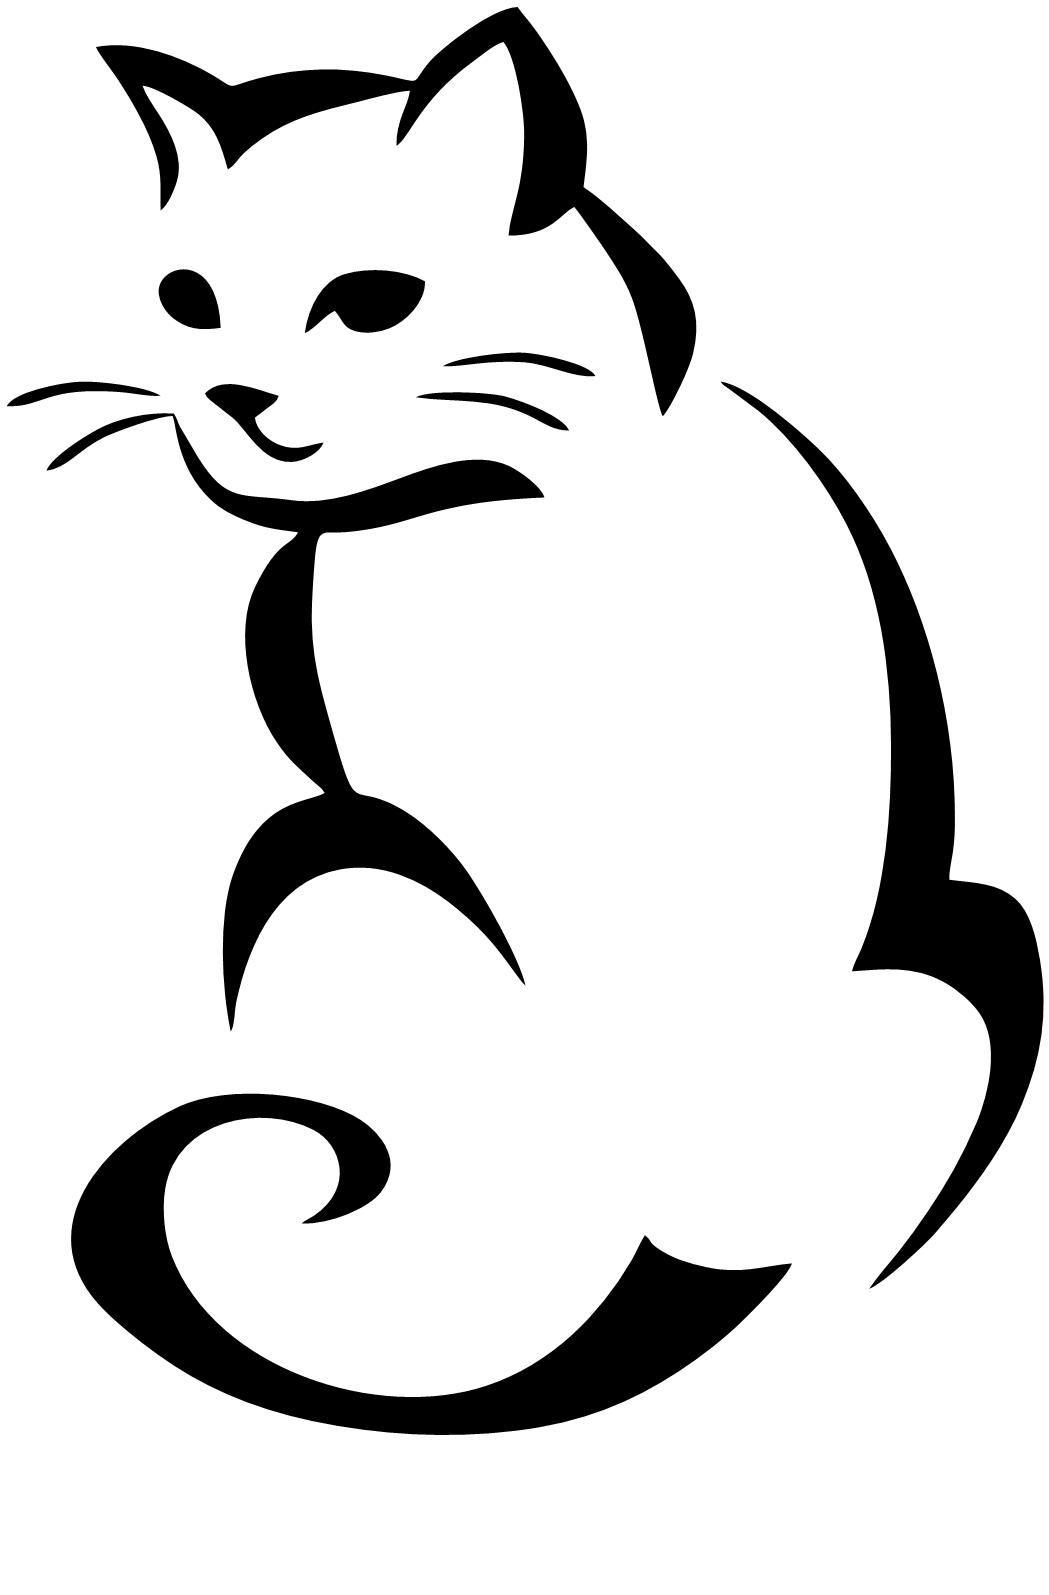 Malvorlage Katze Umriss - tiffanylovesbooks